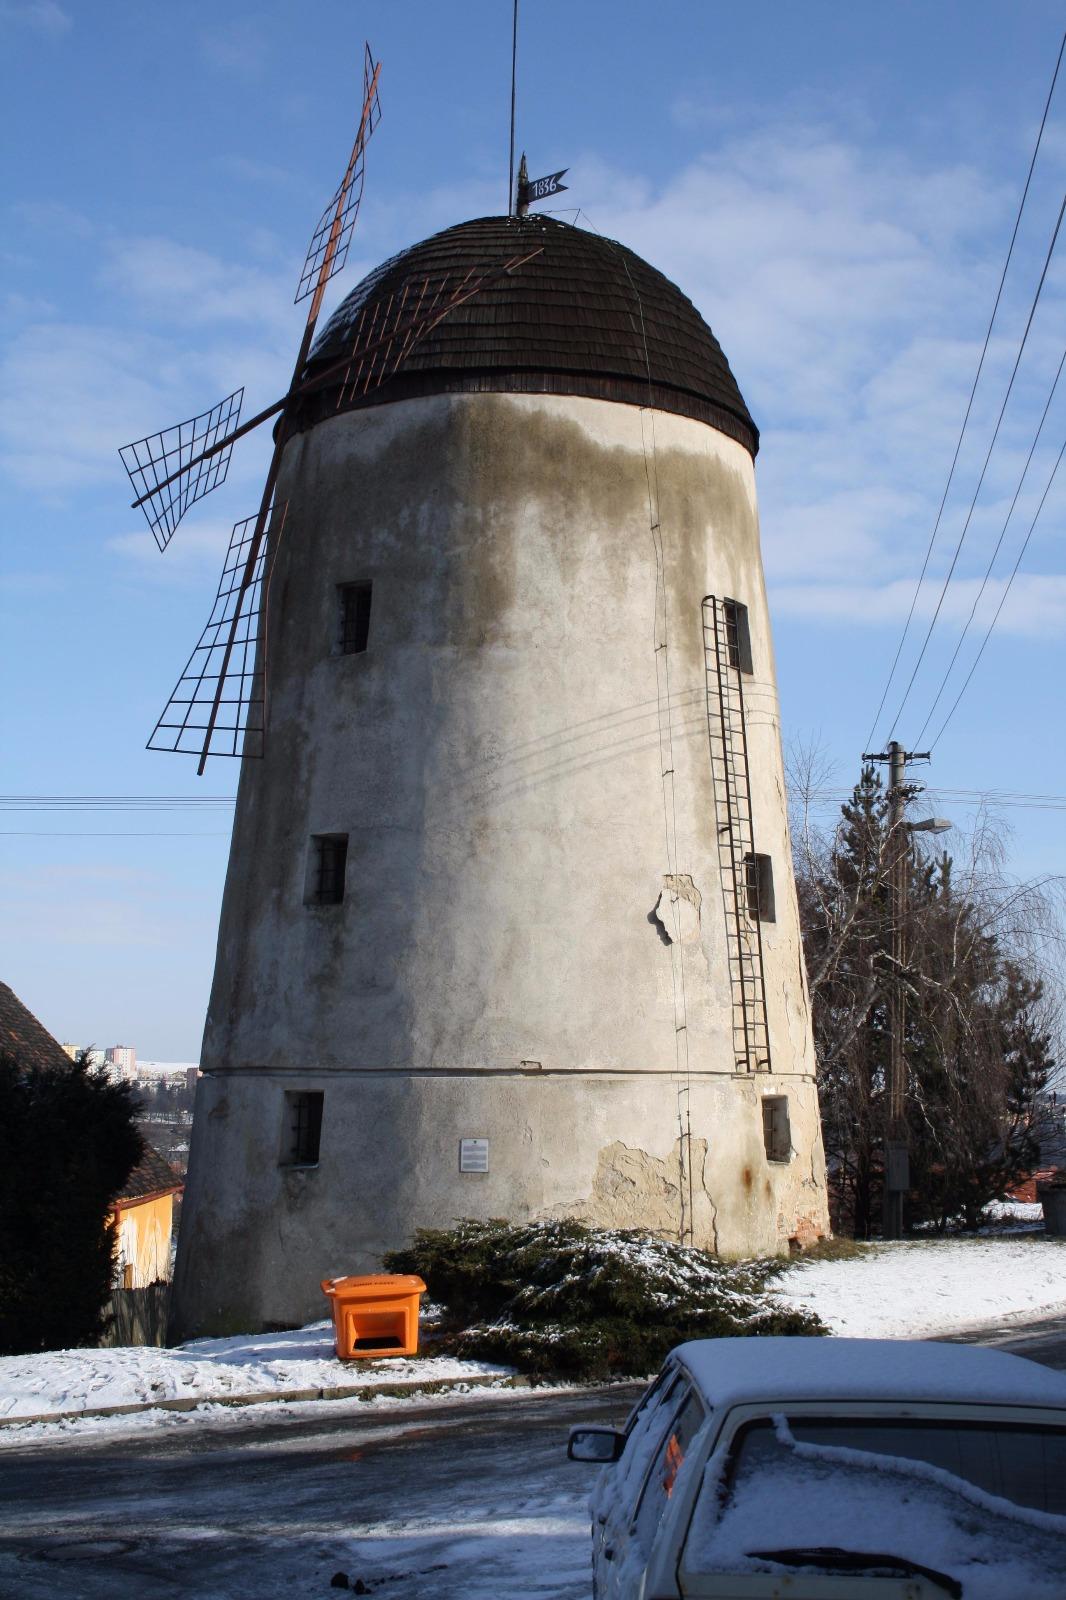 Větrný mlýn Třebíč